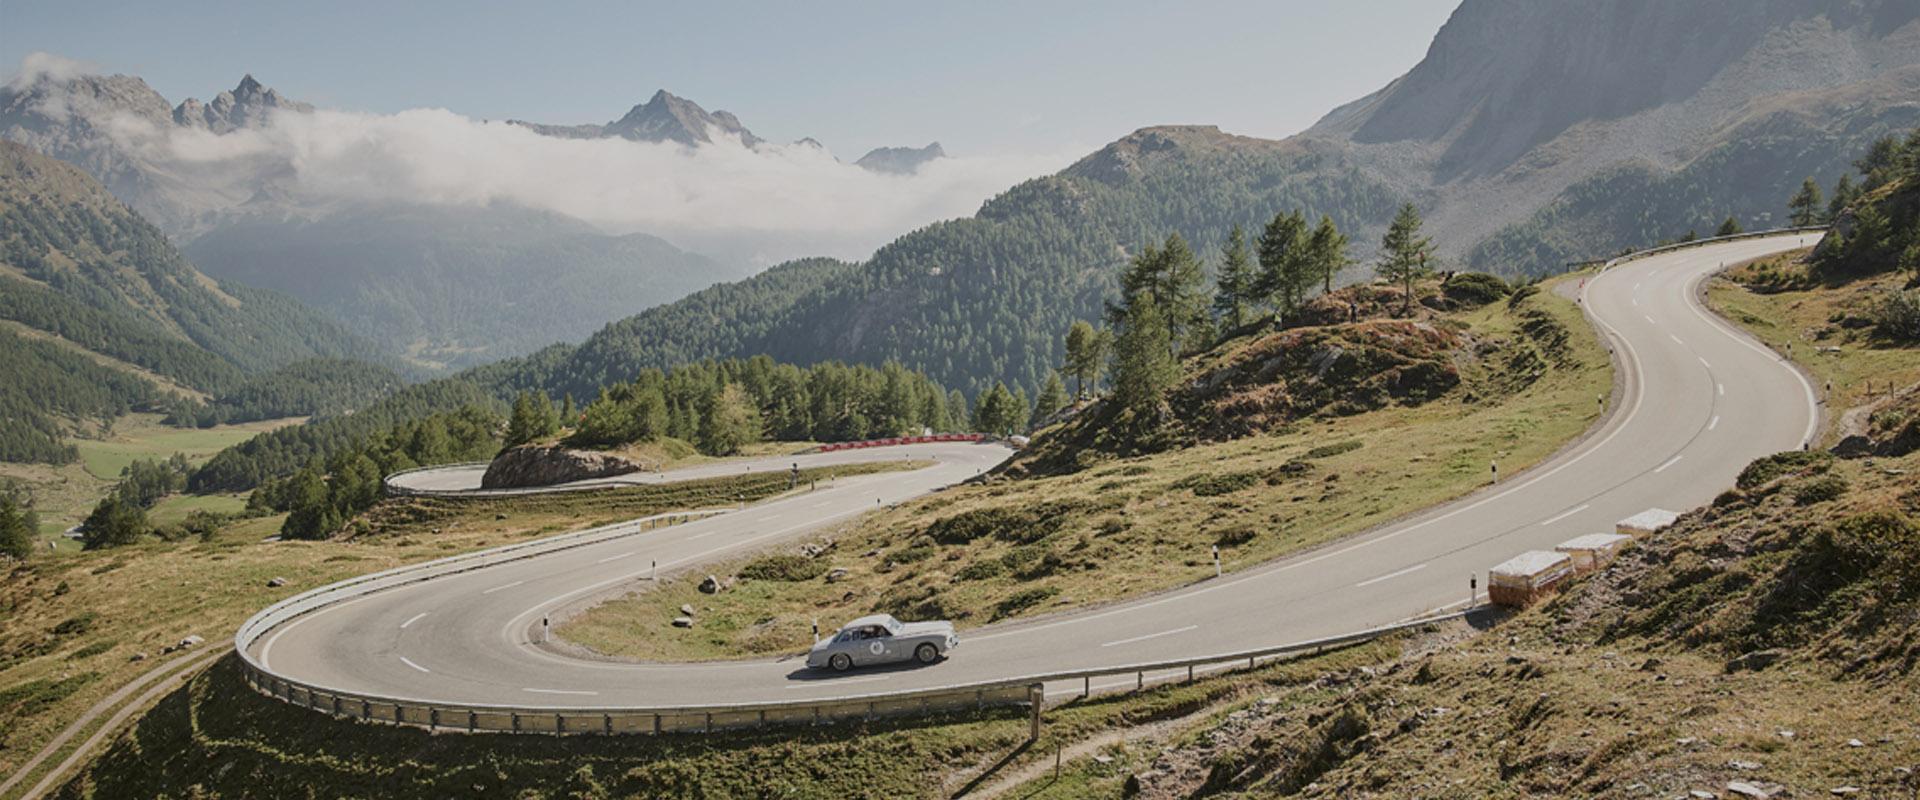 Proud Partner of <br>Bernina Gran Turismo